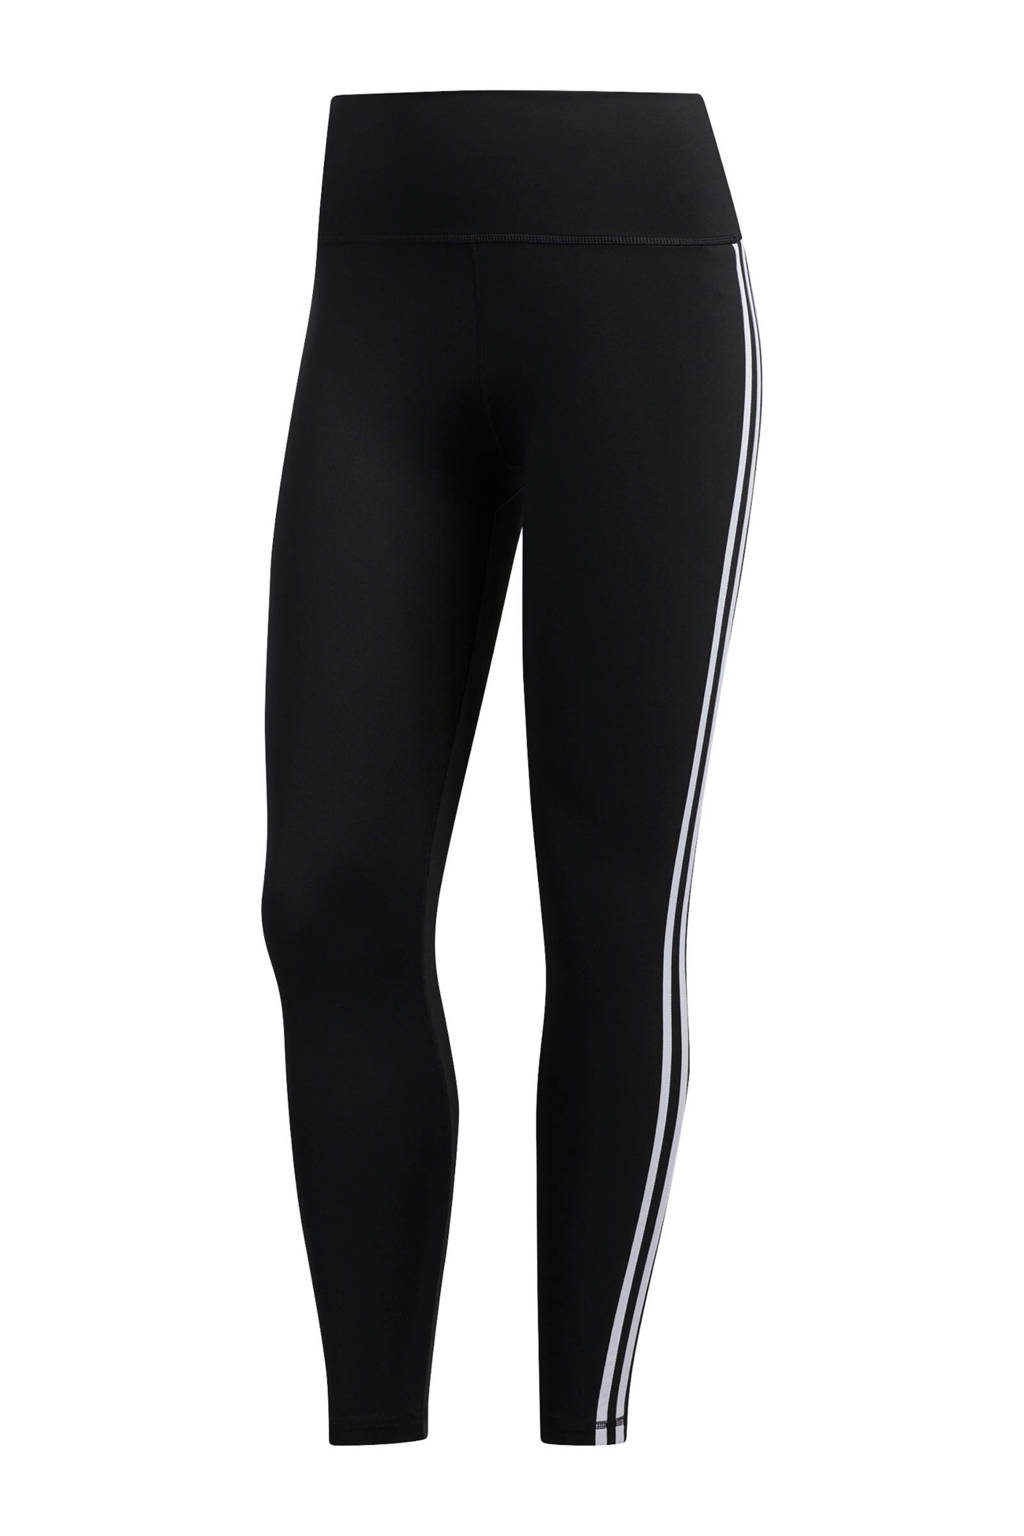 adidas Performance Believe This 2.0 7/8 sportbroek zwart, Zwart